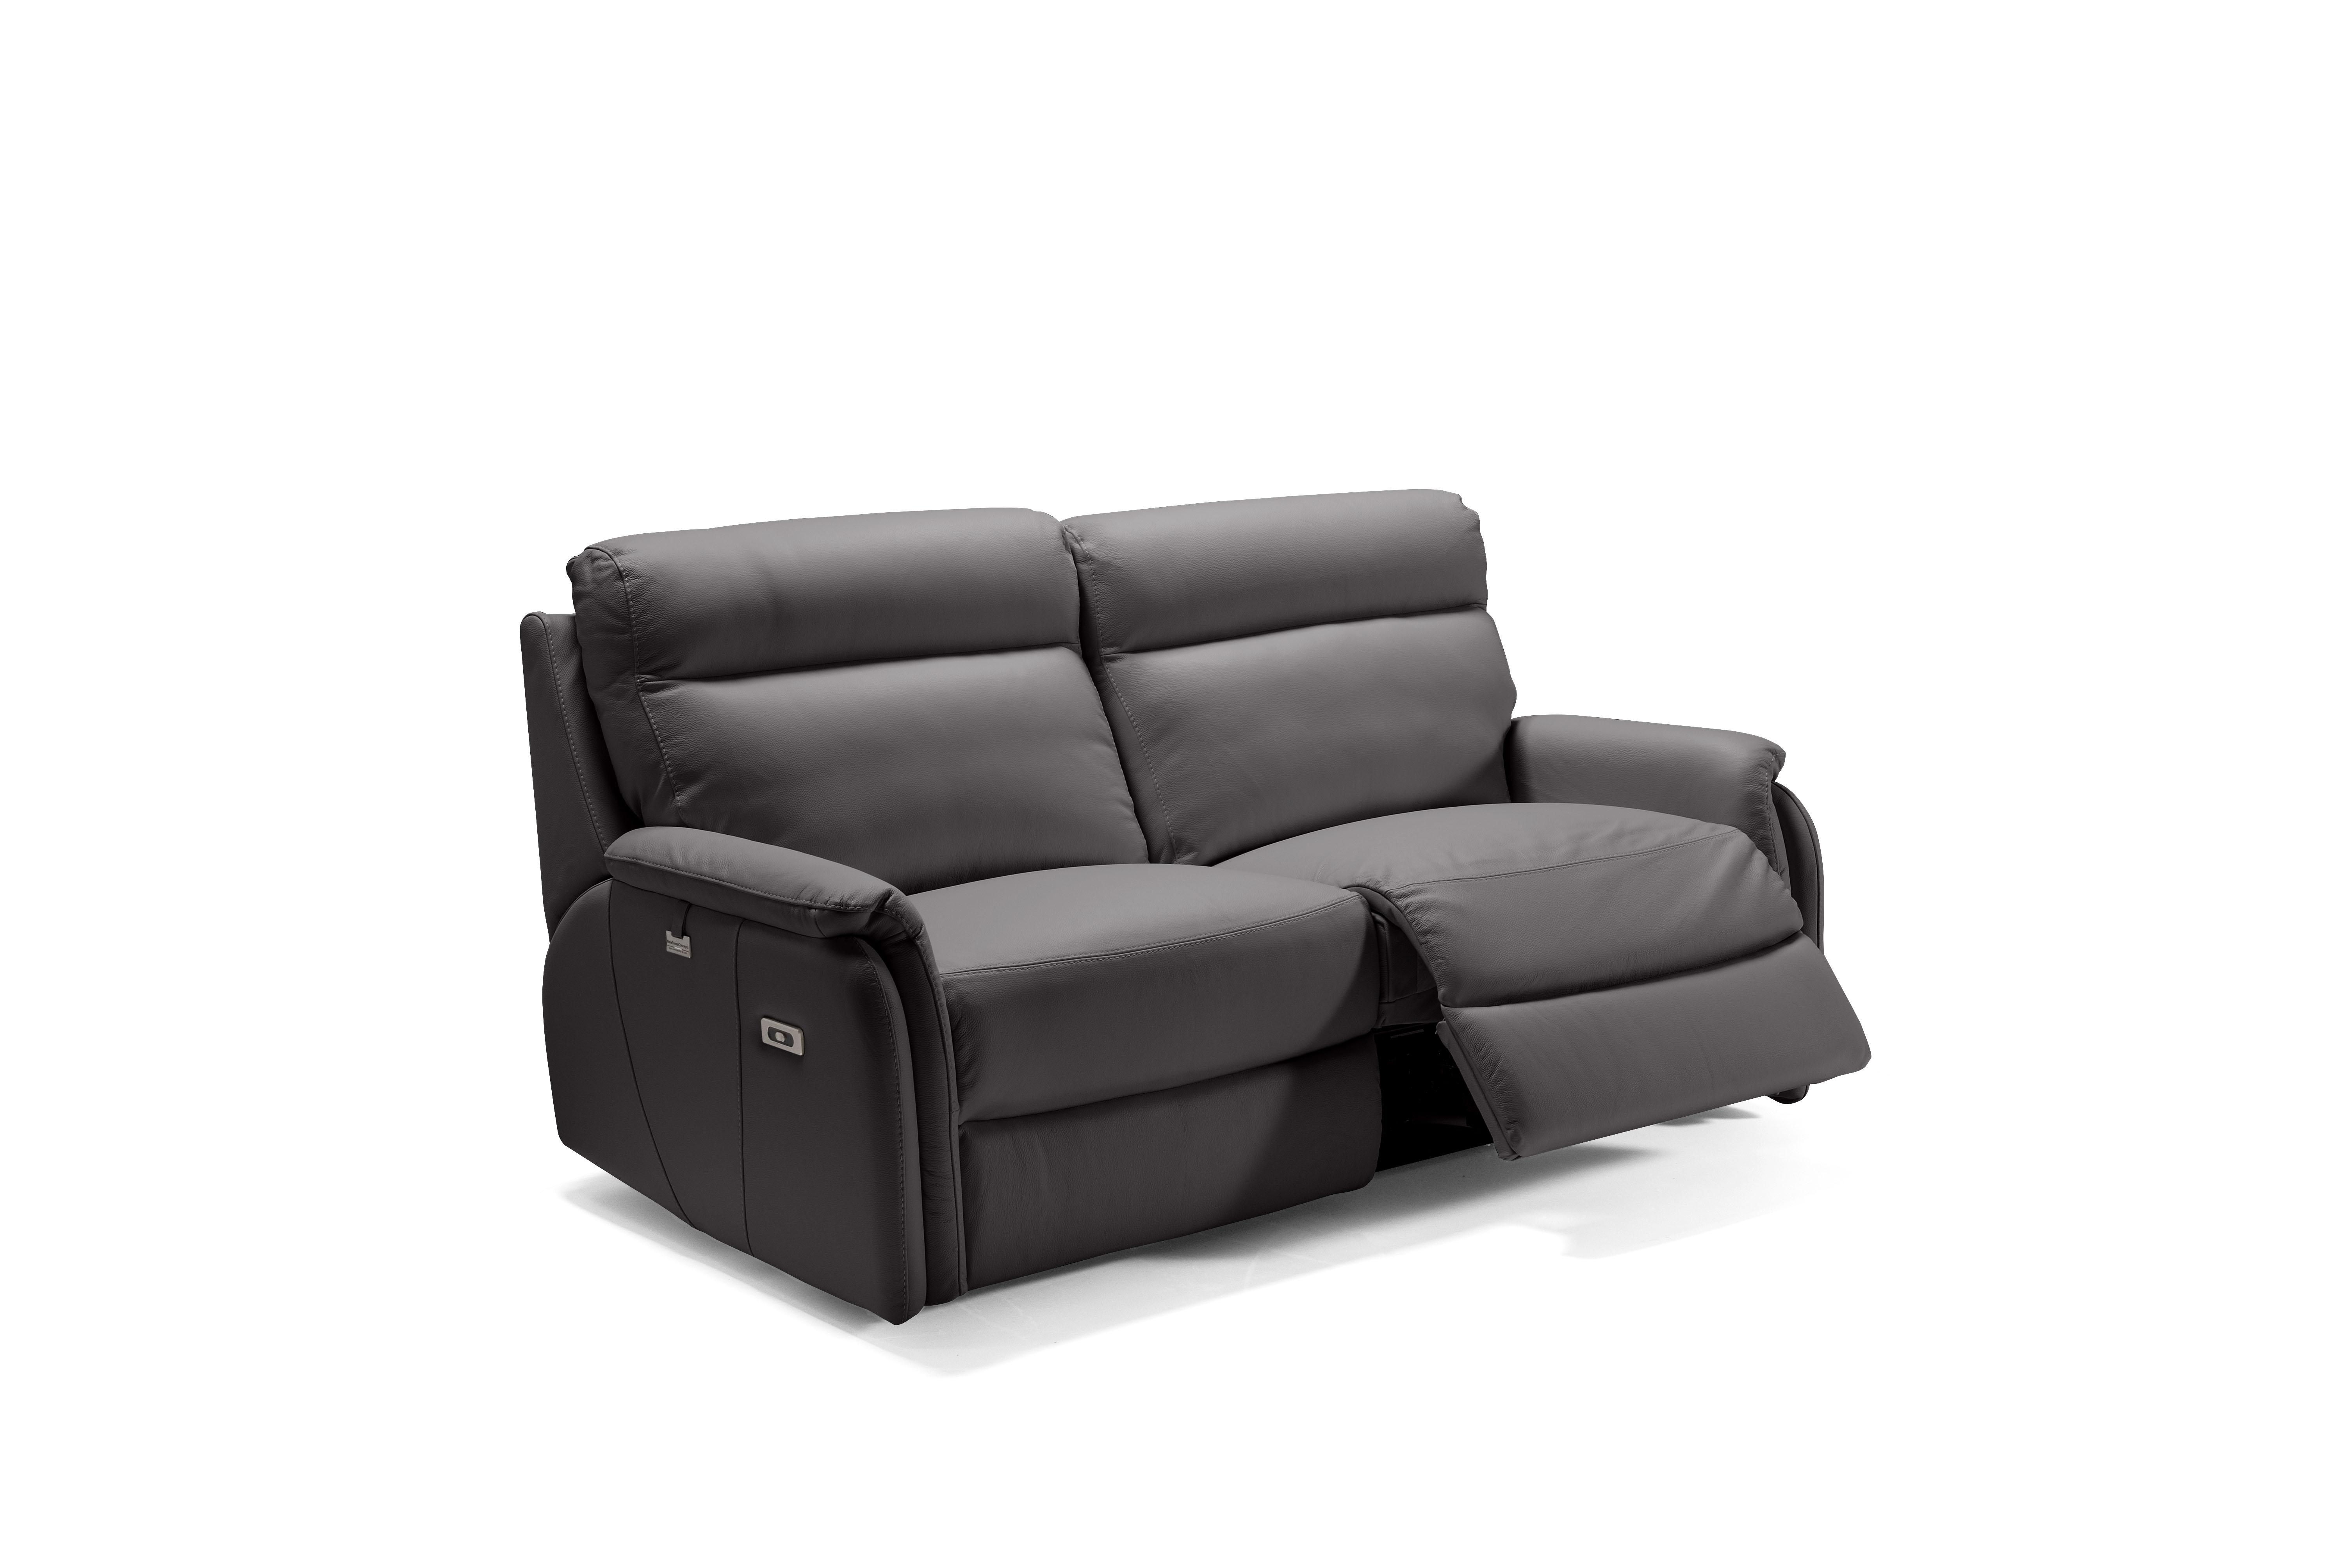 FOX Italian Leather Recliner 3 & 2 Seat Sofa - Dark Grey Grigio RRP £4803 - Image 2 of 4